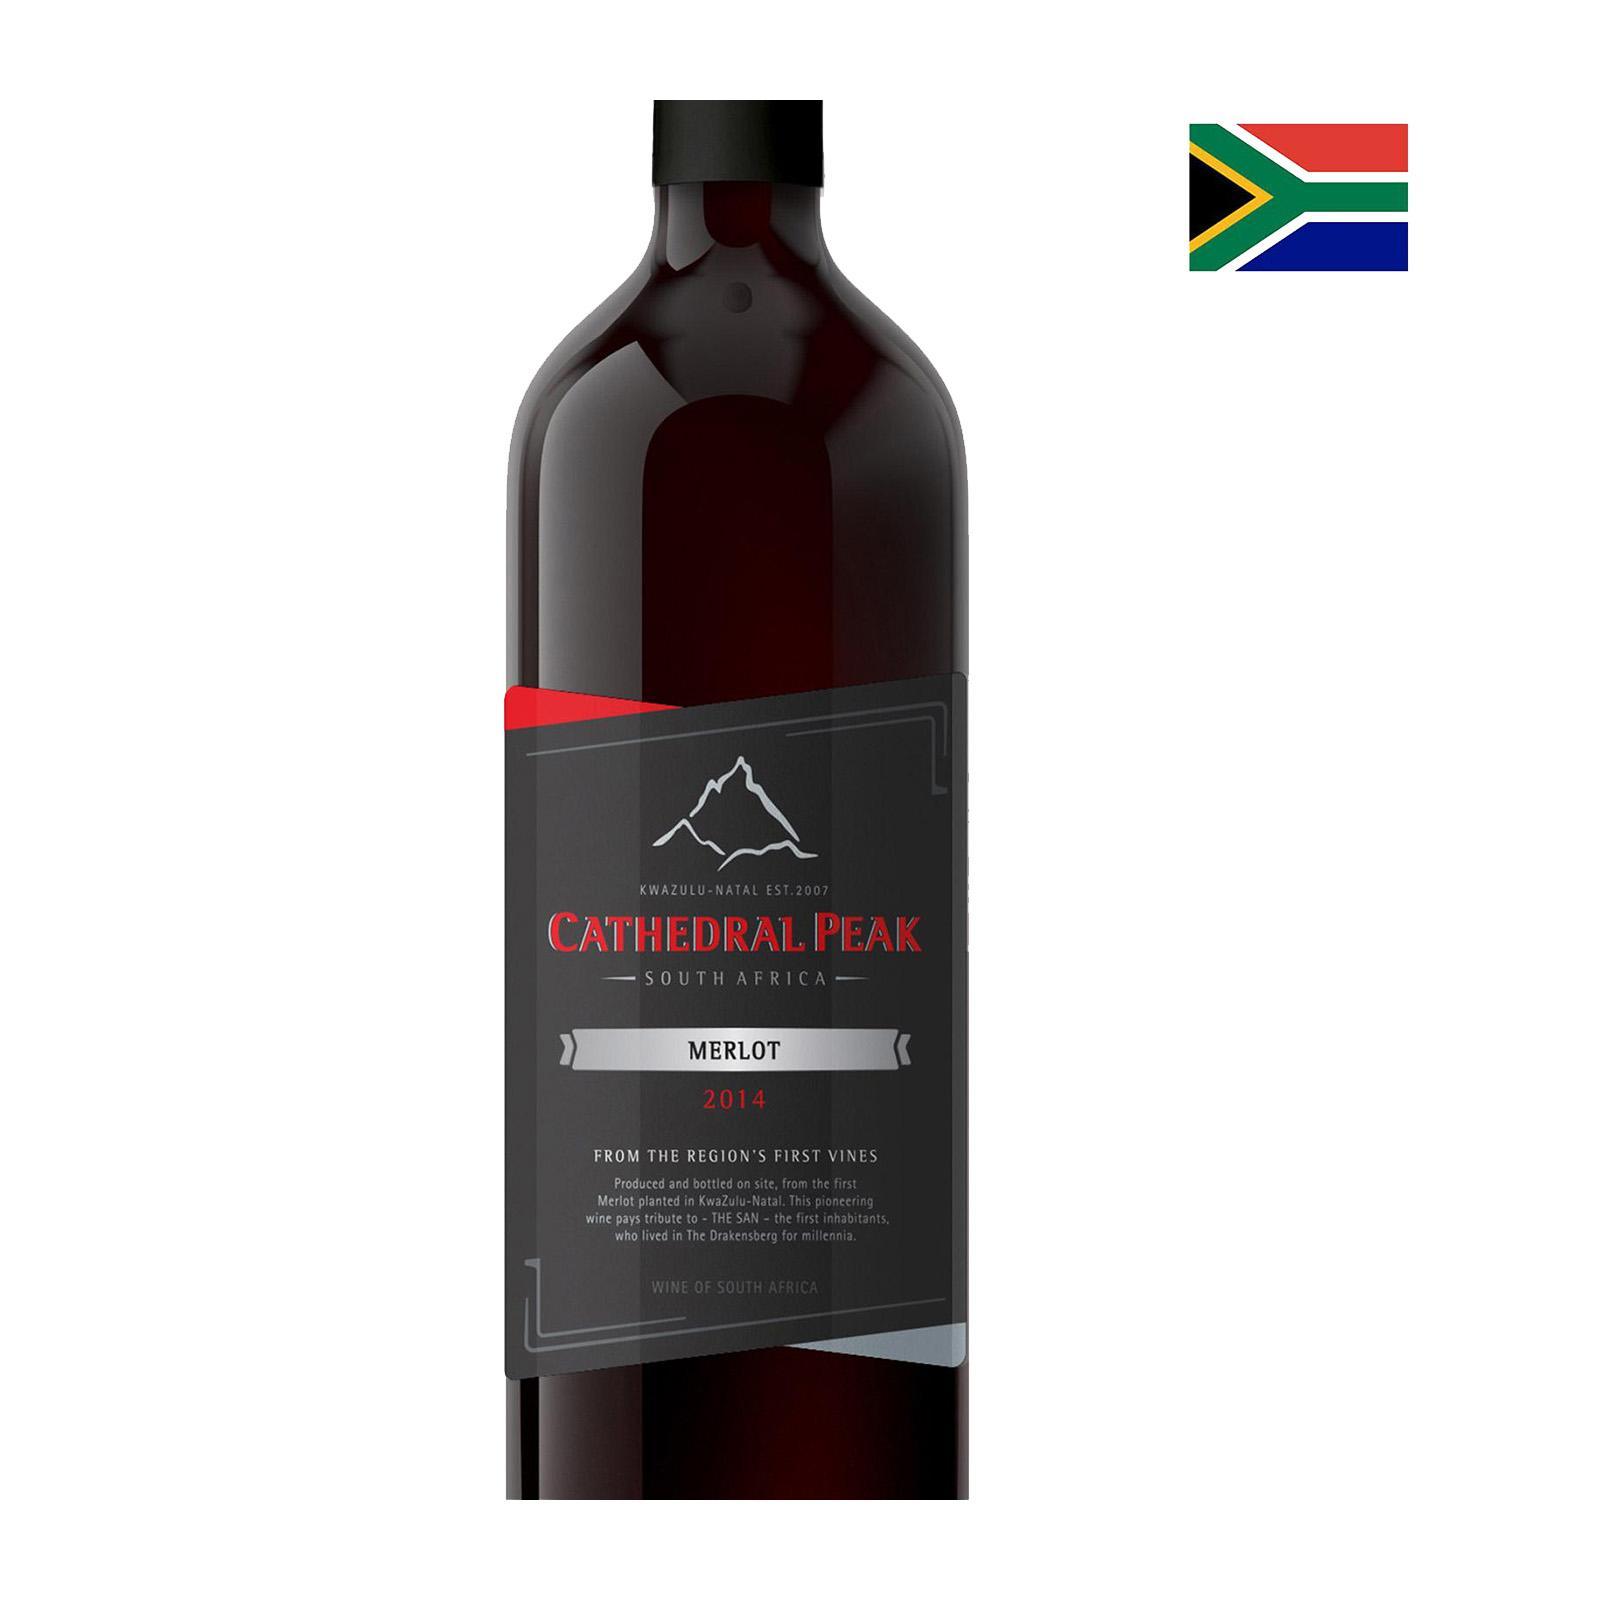 Cathedral Peak Estate Wines Merlot